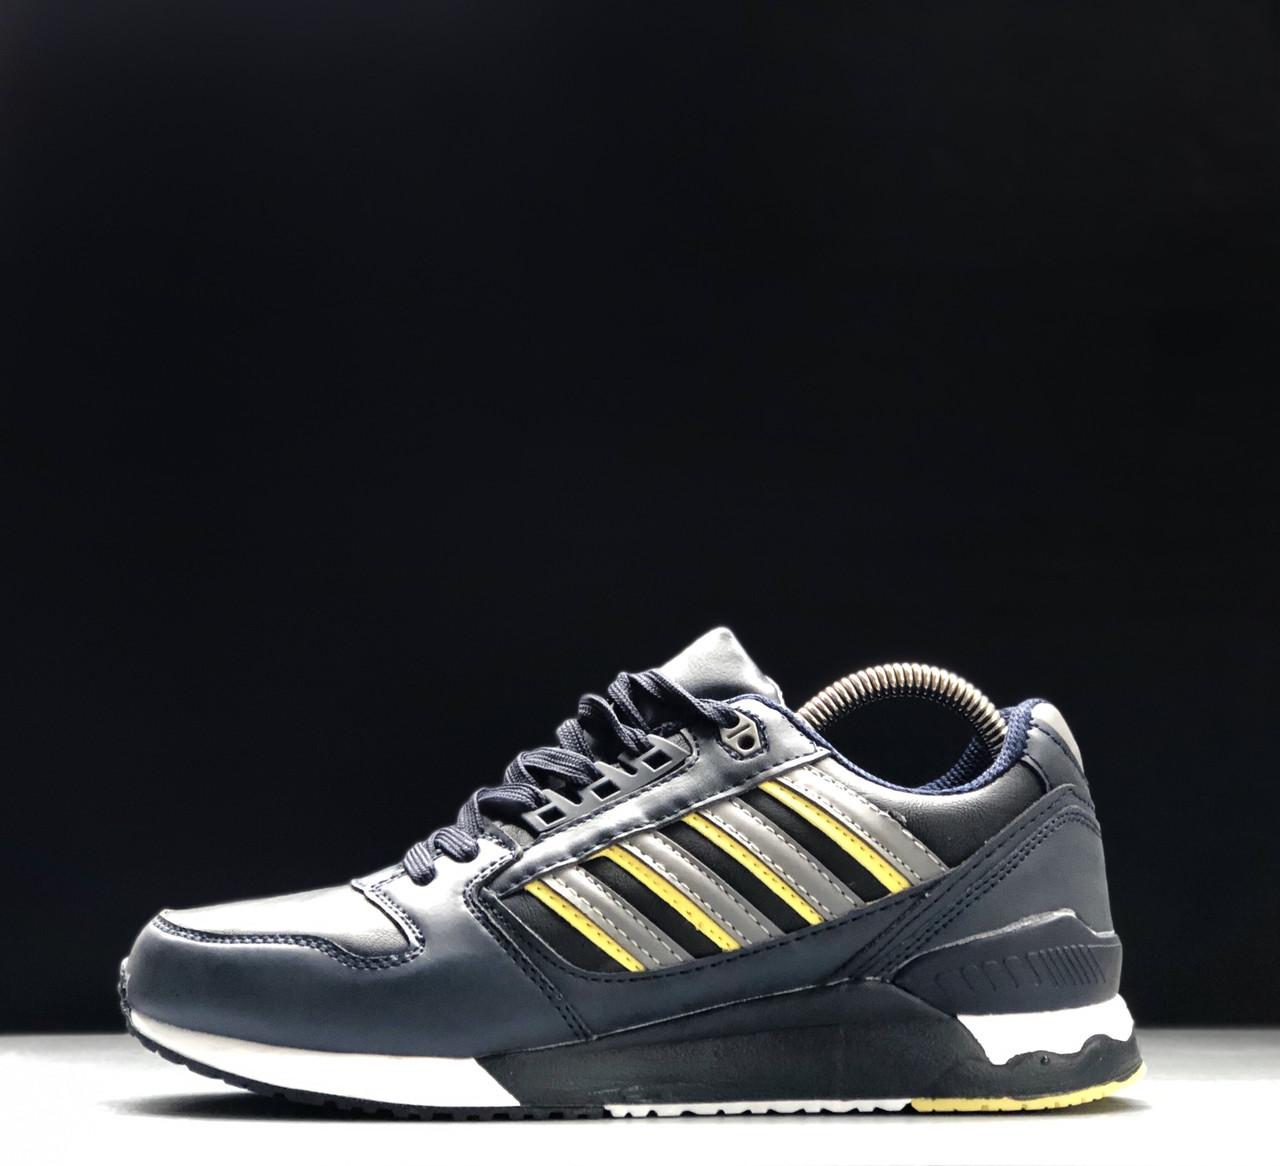 3bc784bf Мужские кроссовки Adidas ZX 750 (копия)